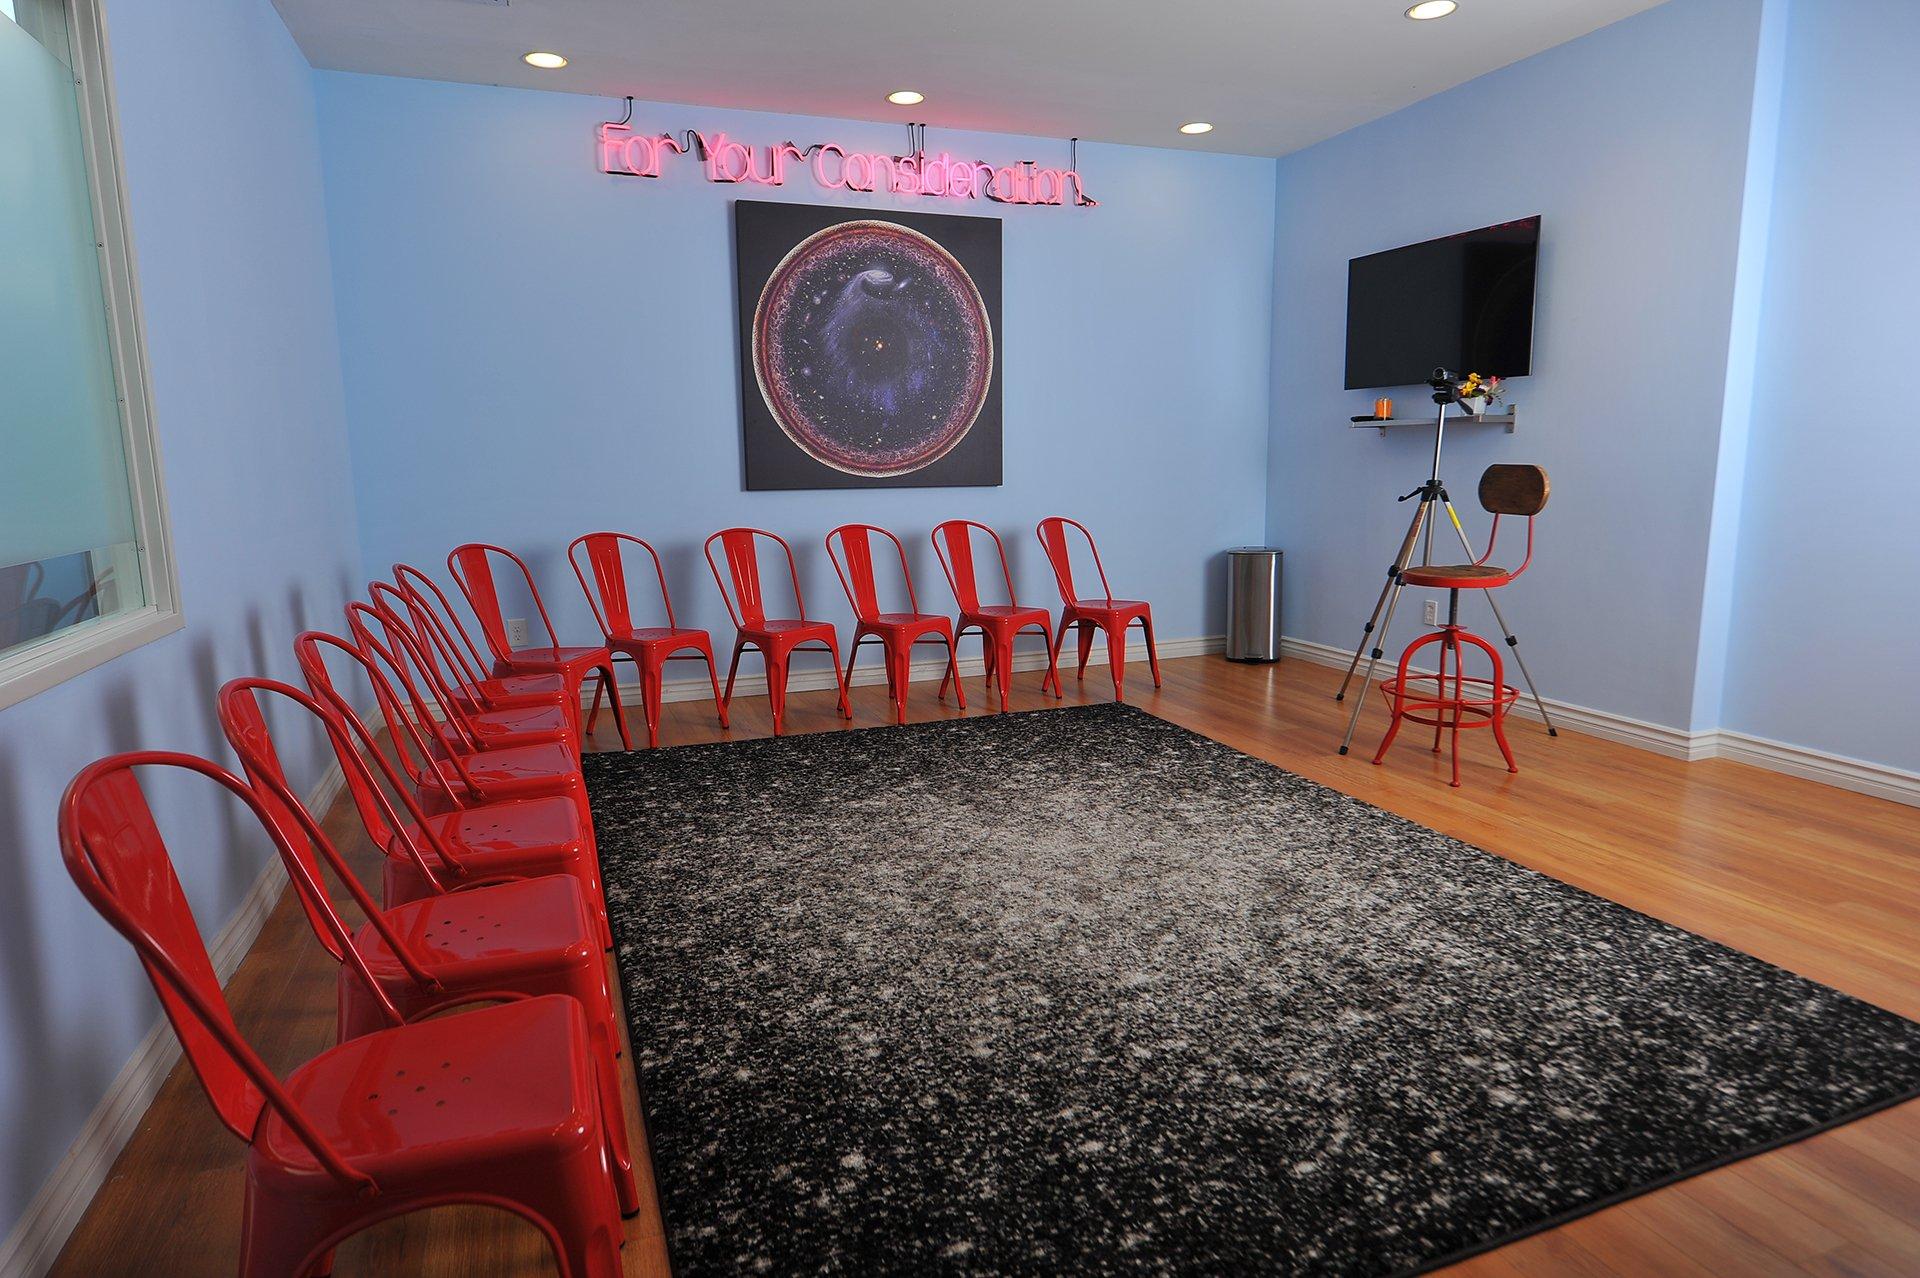 Zak Barnett Studios Classroom - Space Room-Studio Environment